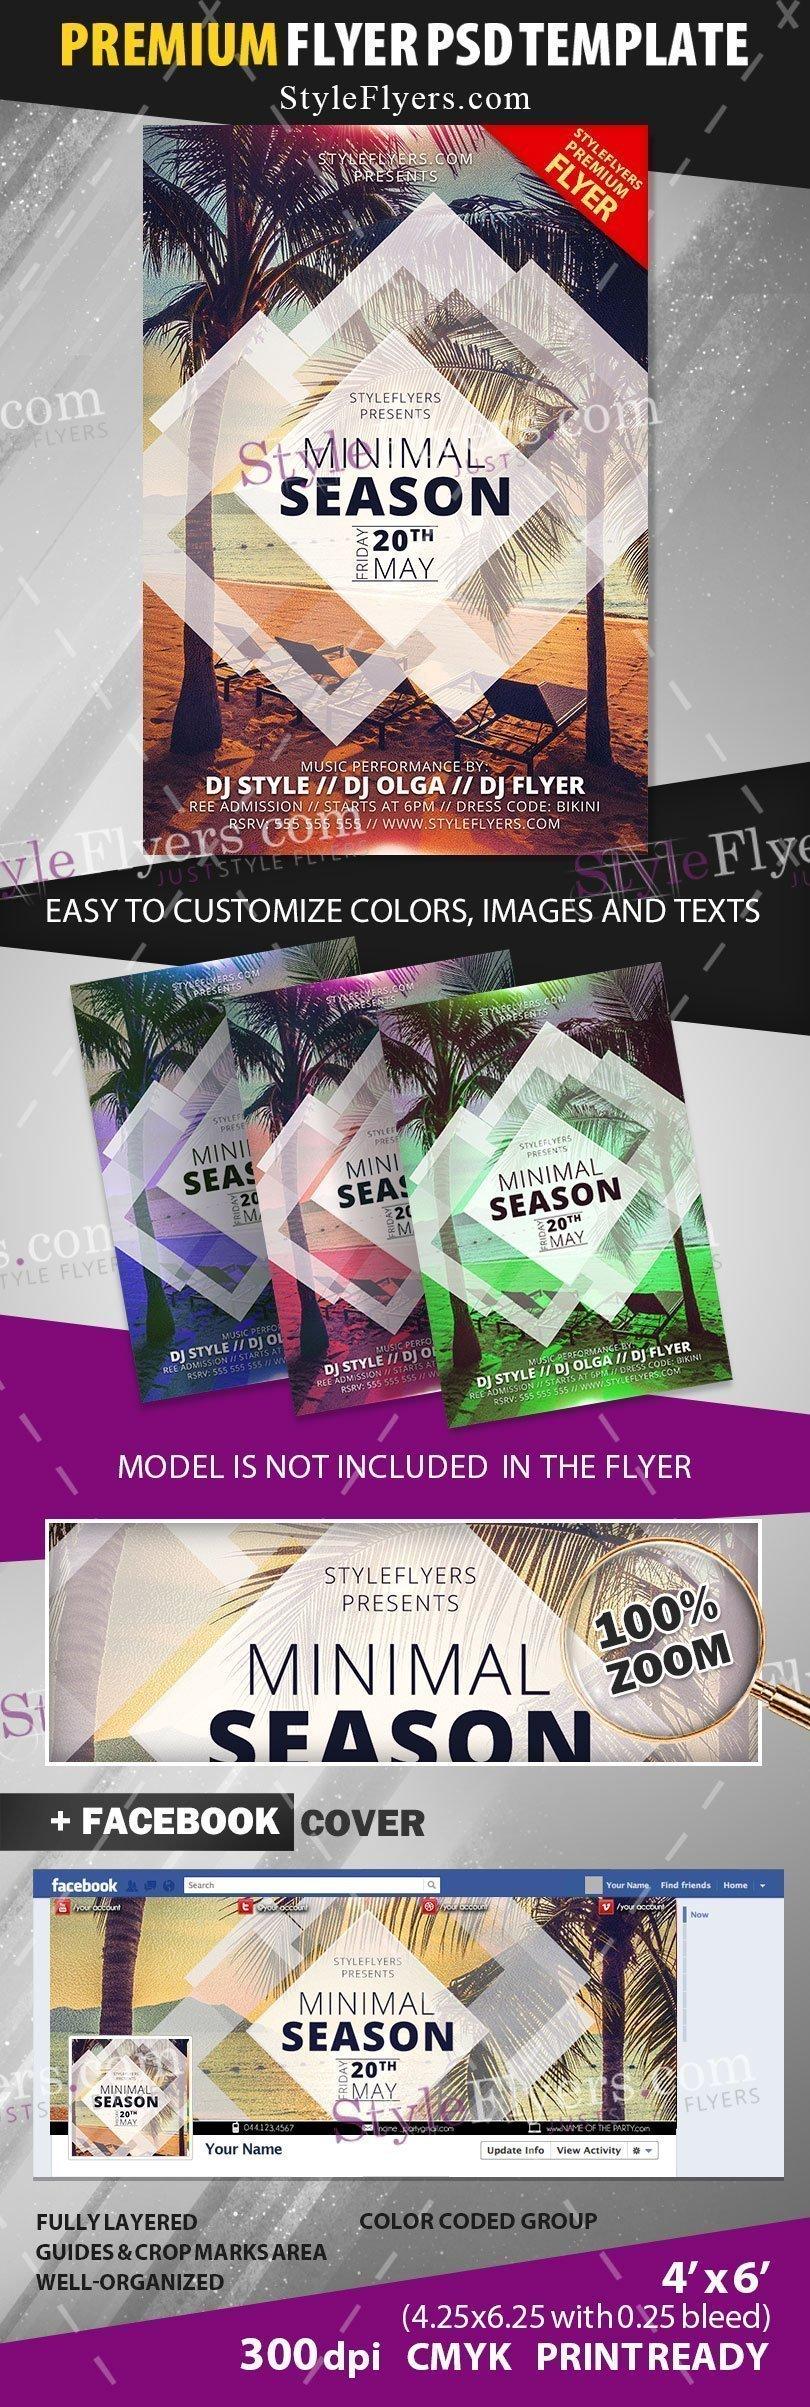 preview_Minimal_Season_Flyer_premium_template